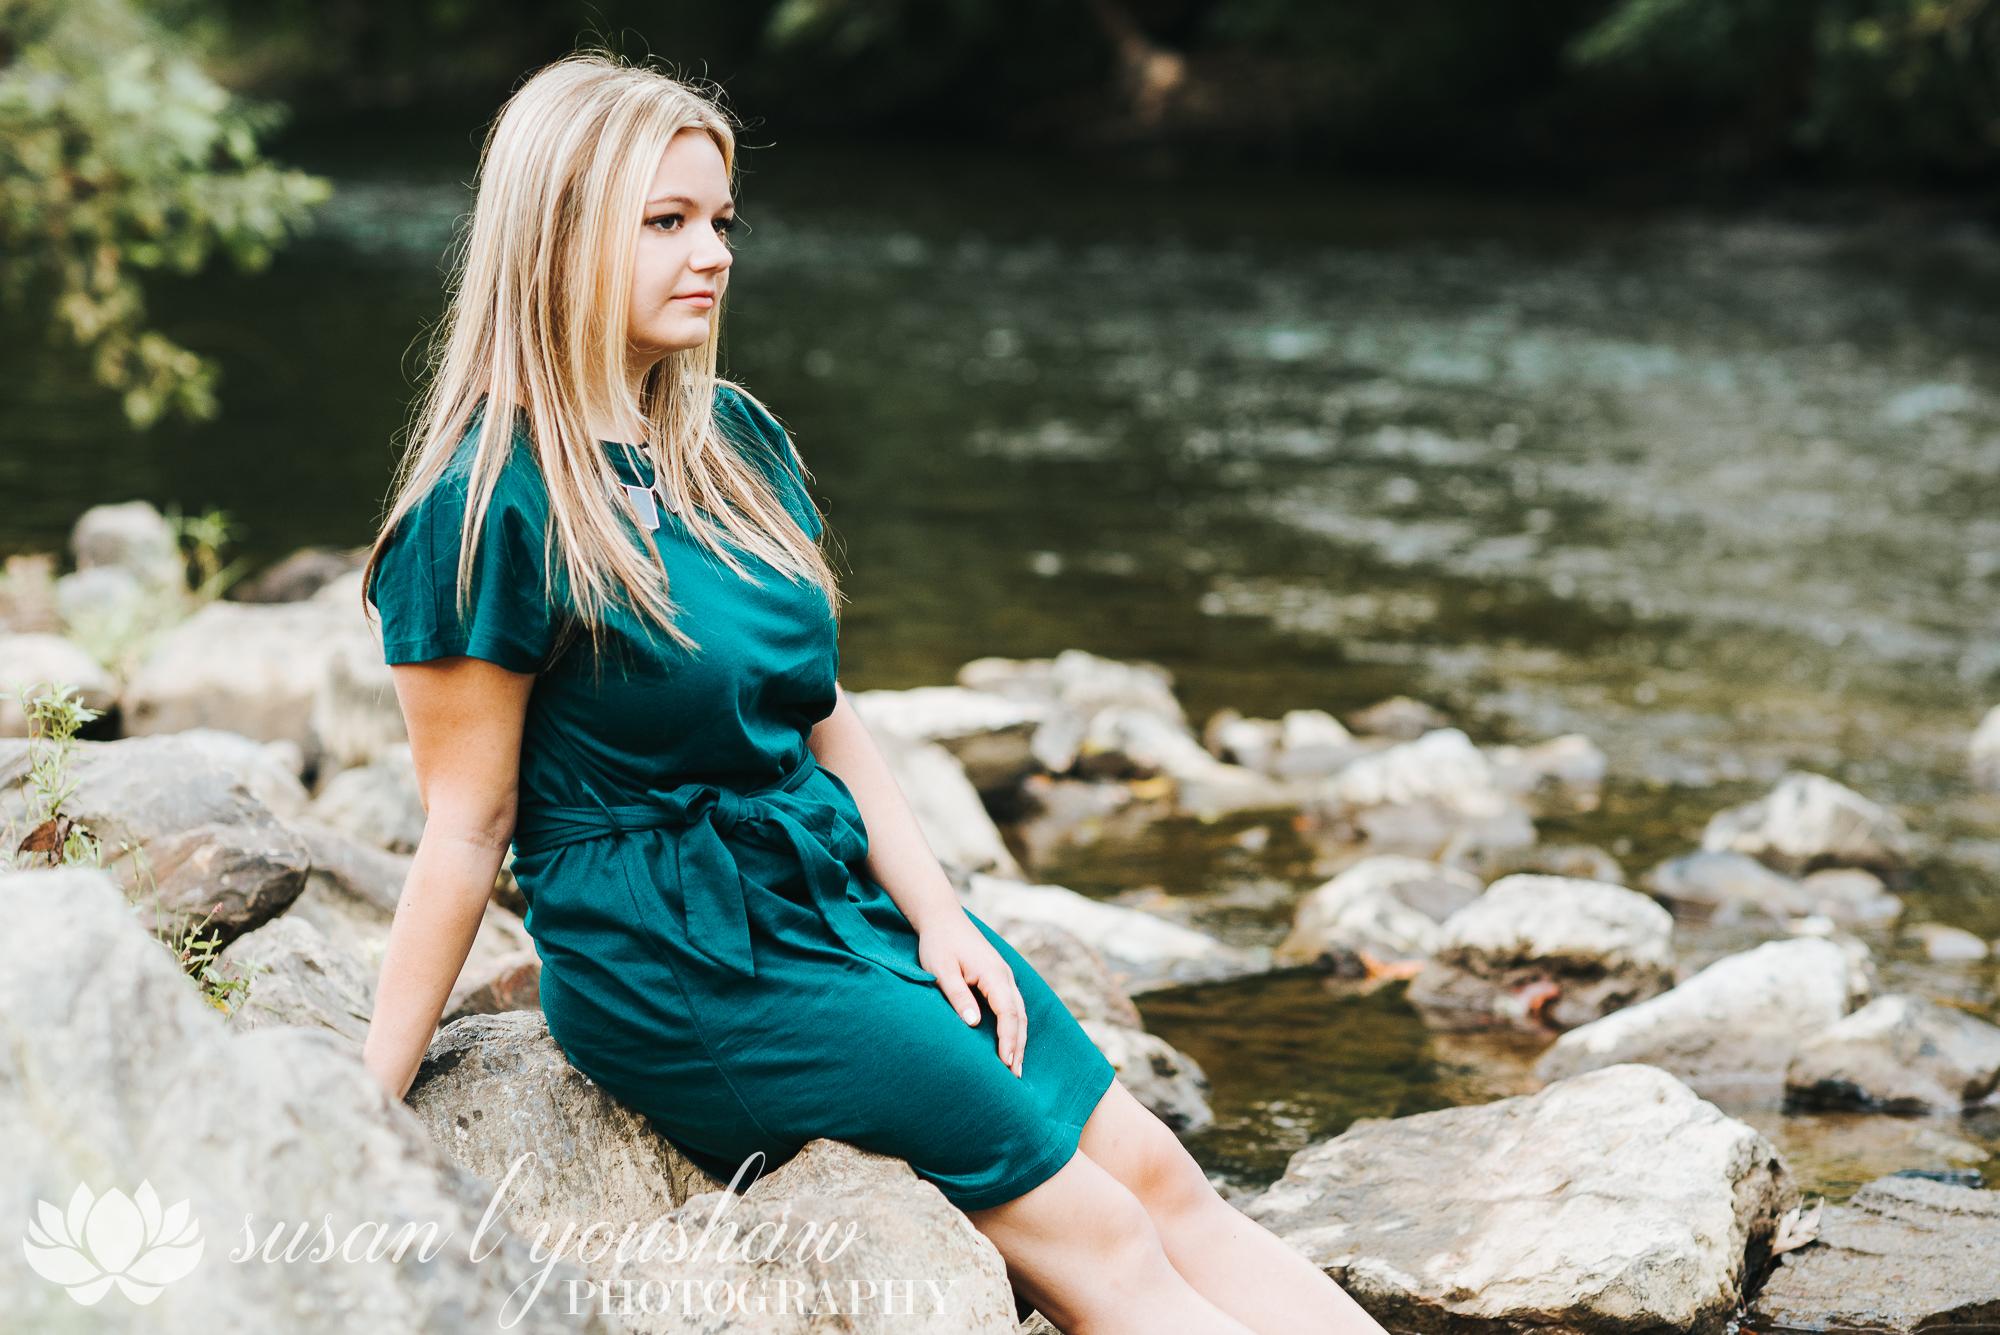 BLOG Karrie Bower 08-16-2018 SLY Photography LLC-2.jpg